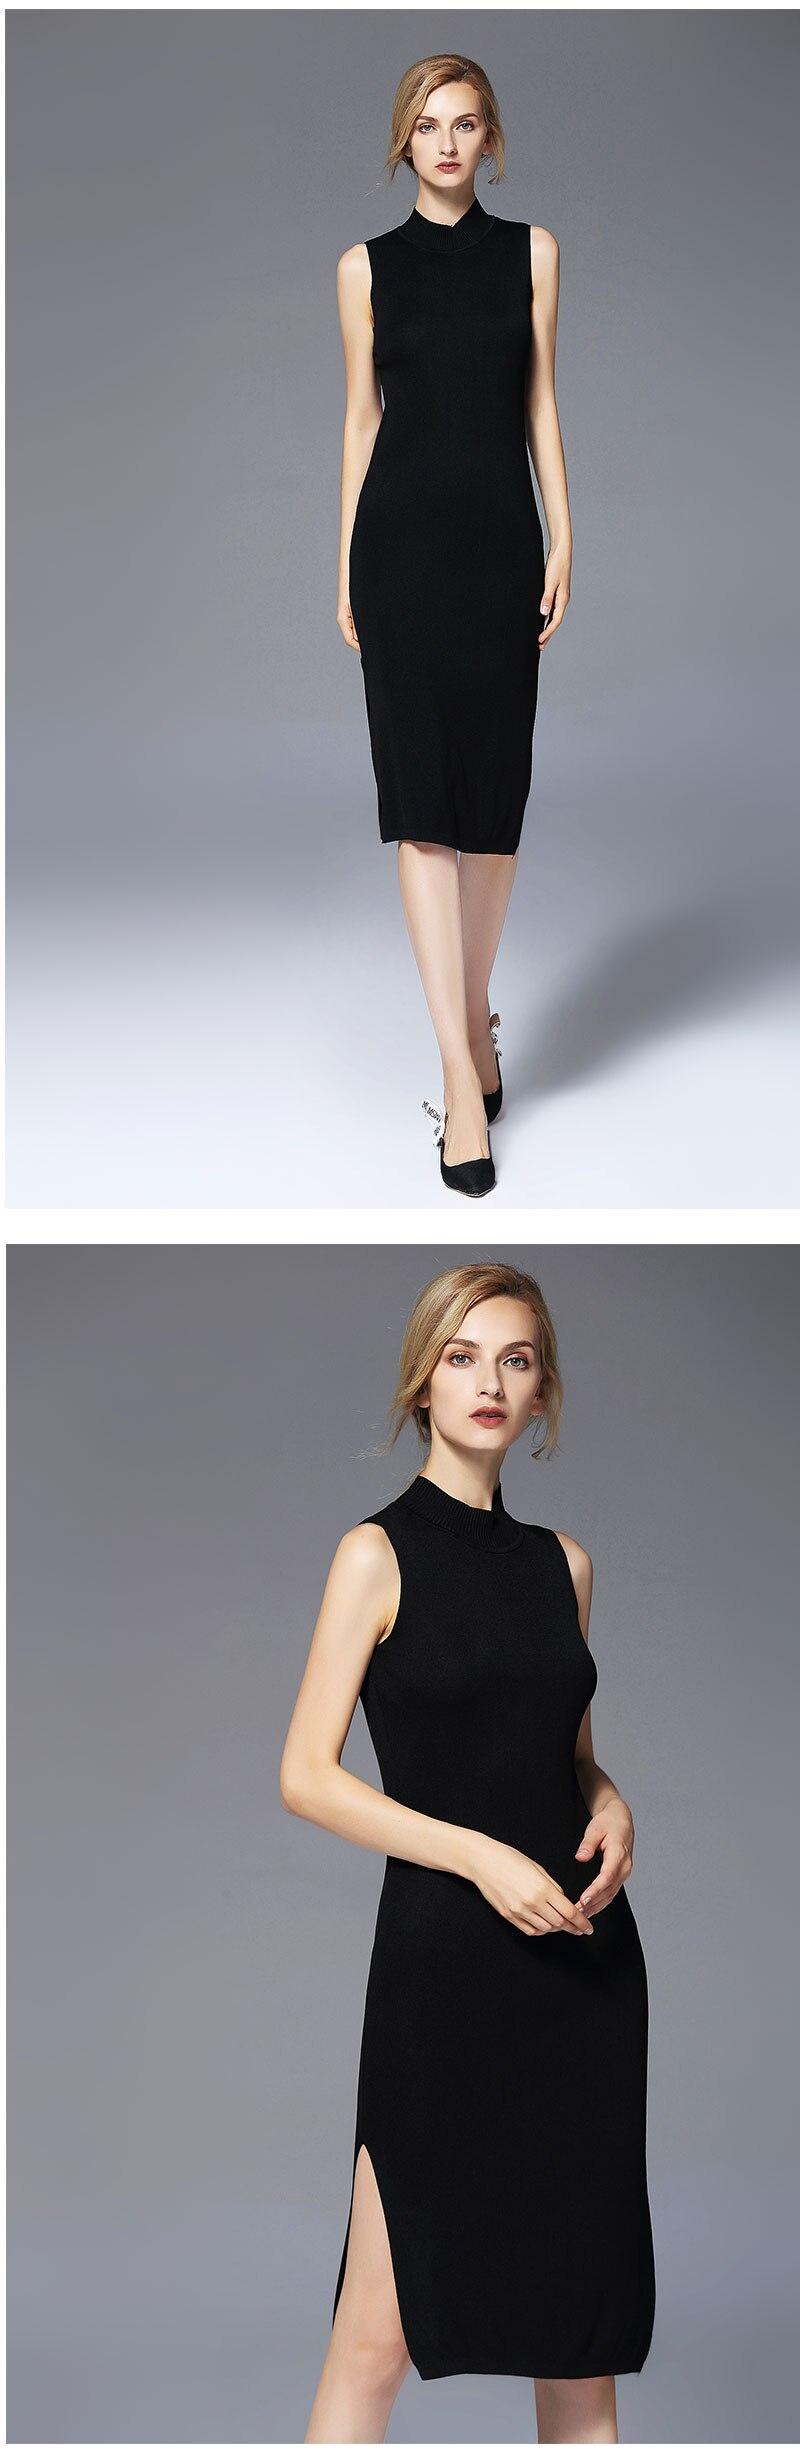 New Fashion Autumn Women Dresses Slim Sleeveless Dress Ladies Turtleneck Knitted Solid Vestidos Female 2017 Knee-Length Dress